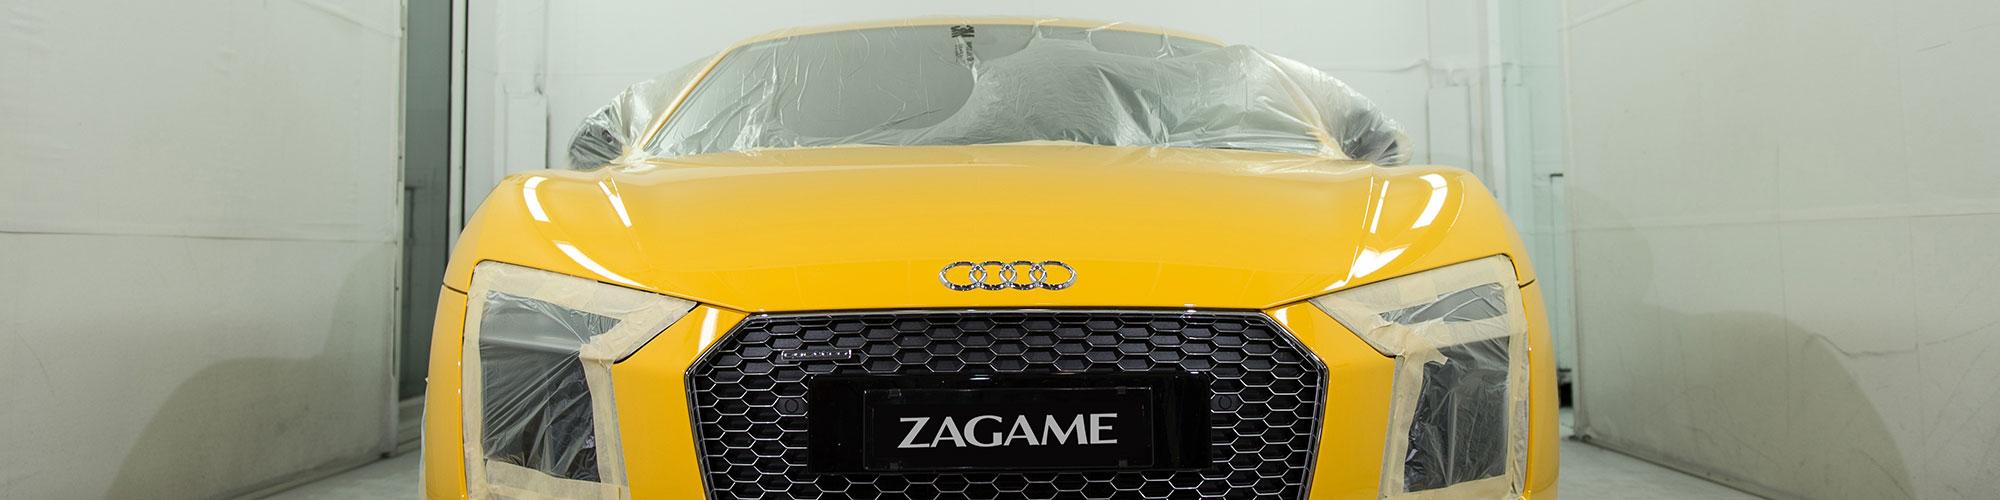 Zagame Autobody Australias Leading Audi Panel Smash Repairer - Audi auto body